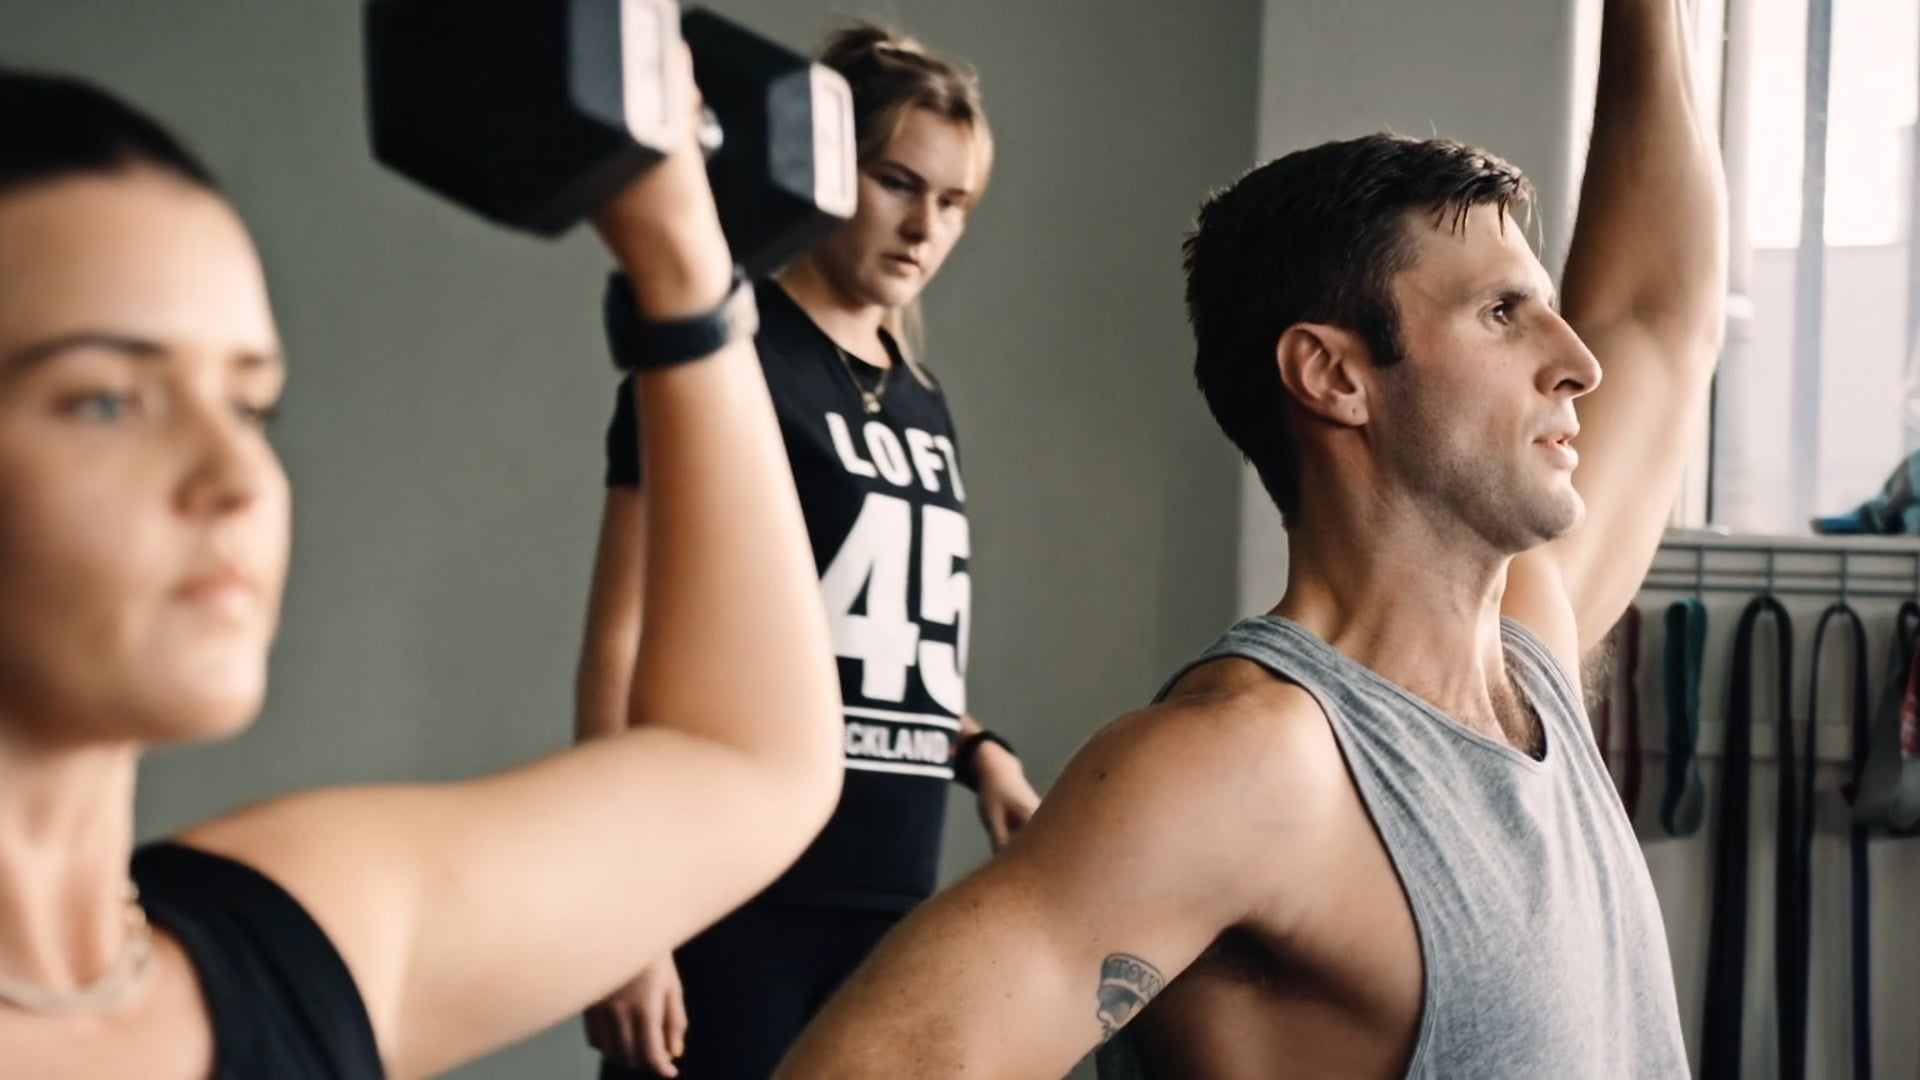 Loft 45 - Personal Training